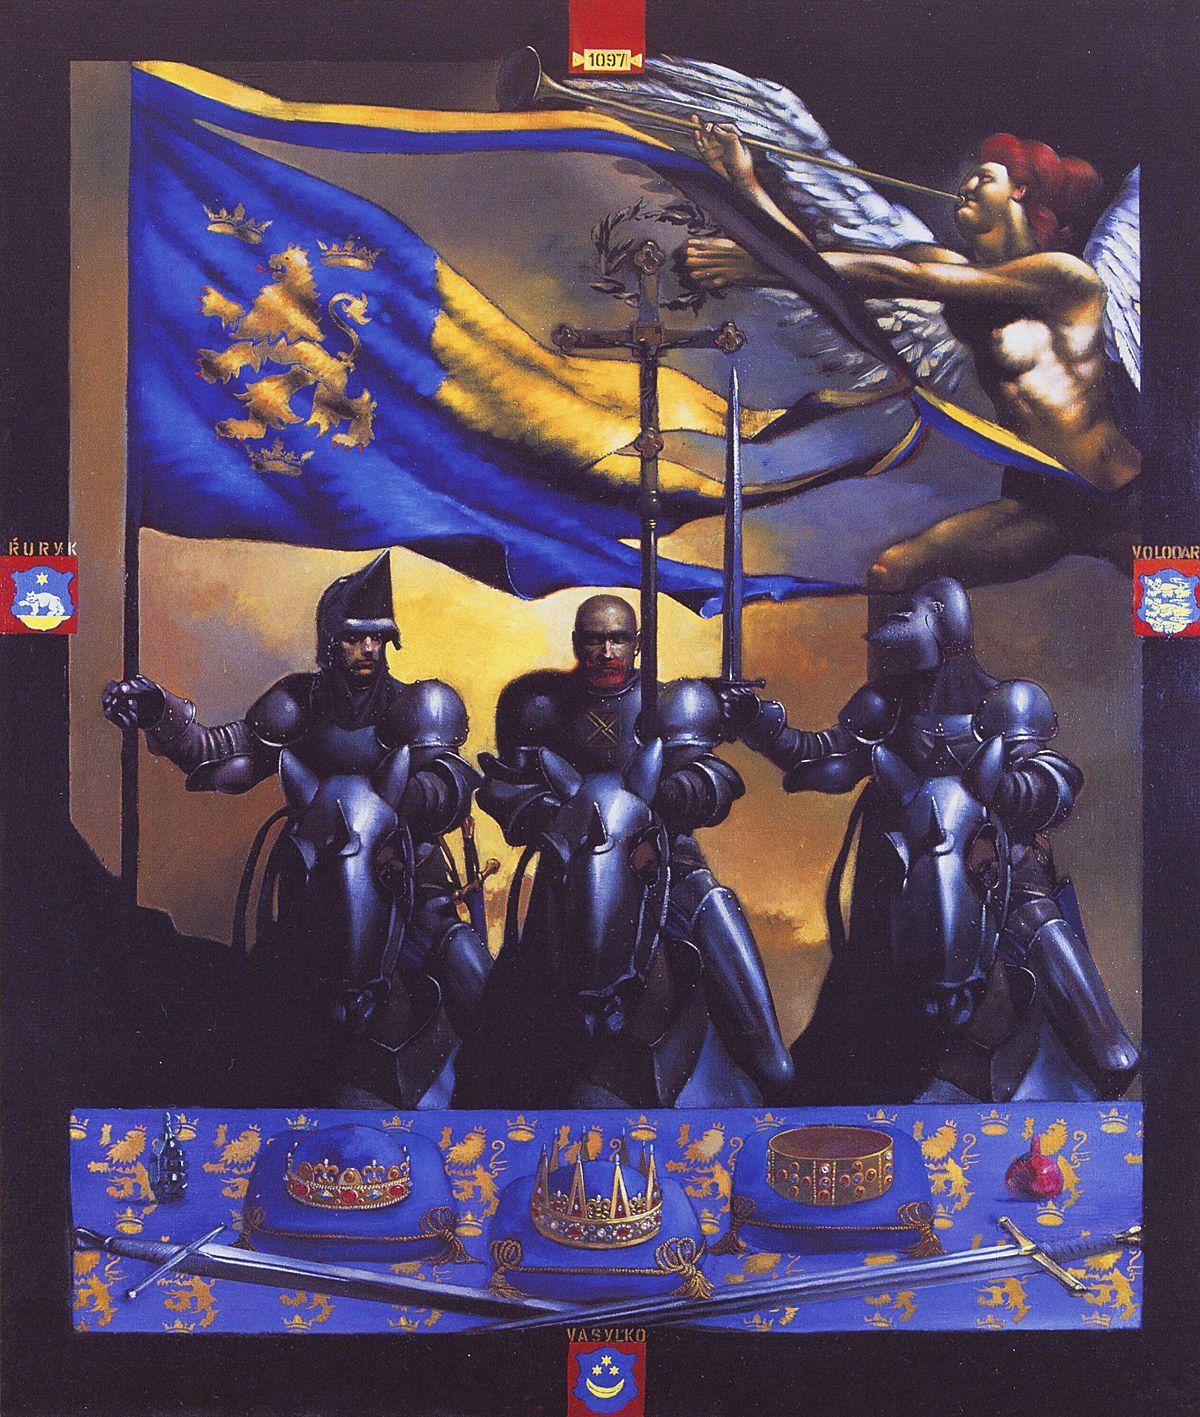 Володимир Костирко. 1097, 2000